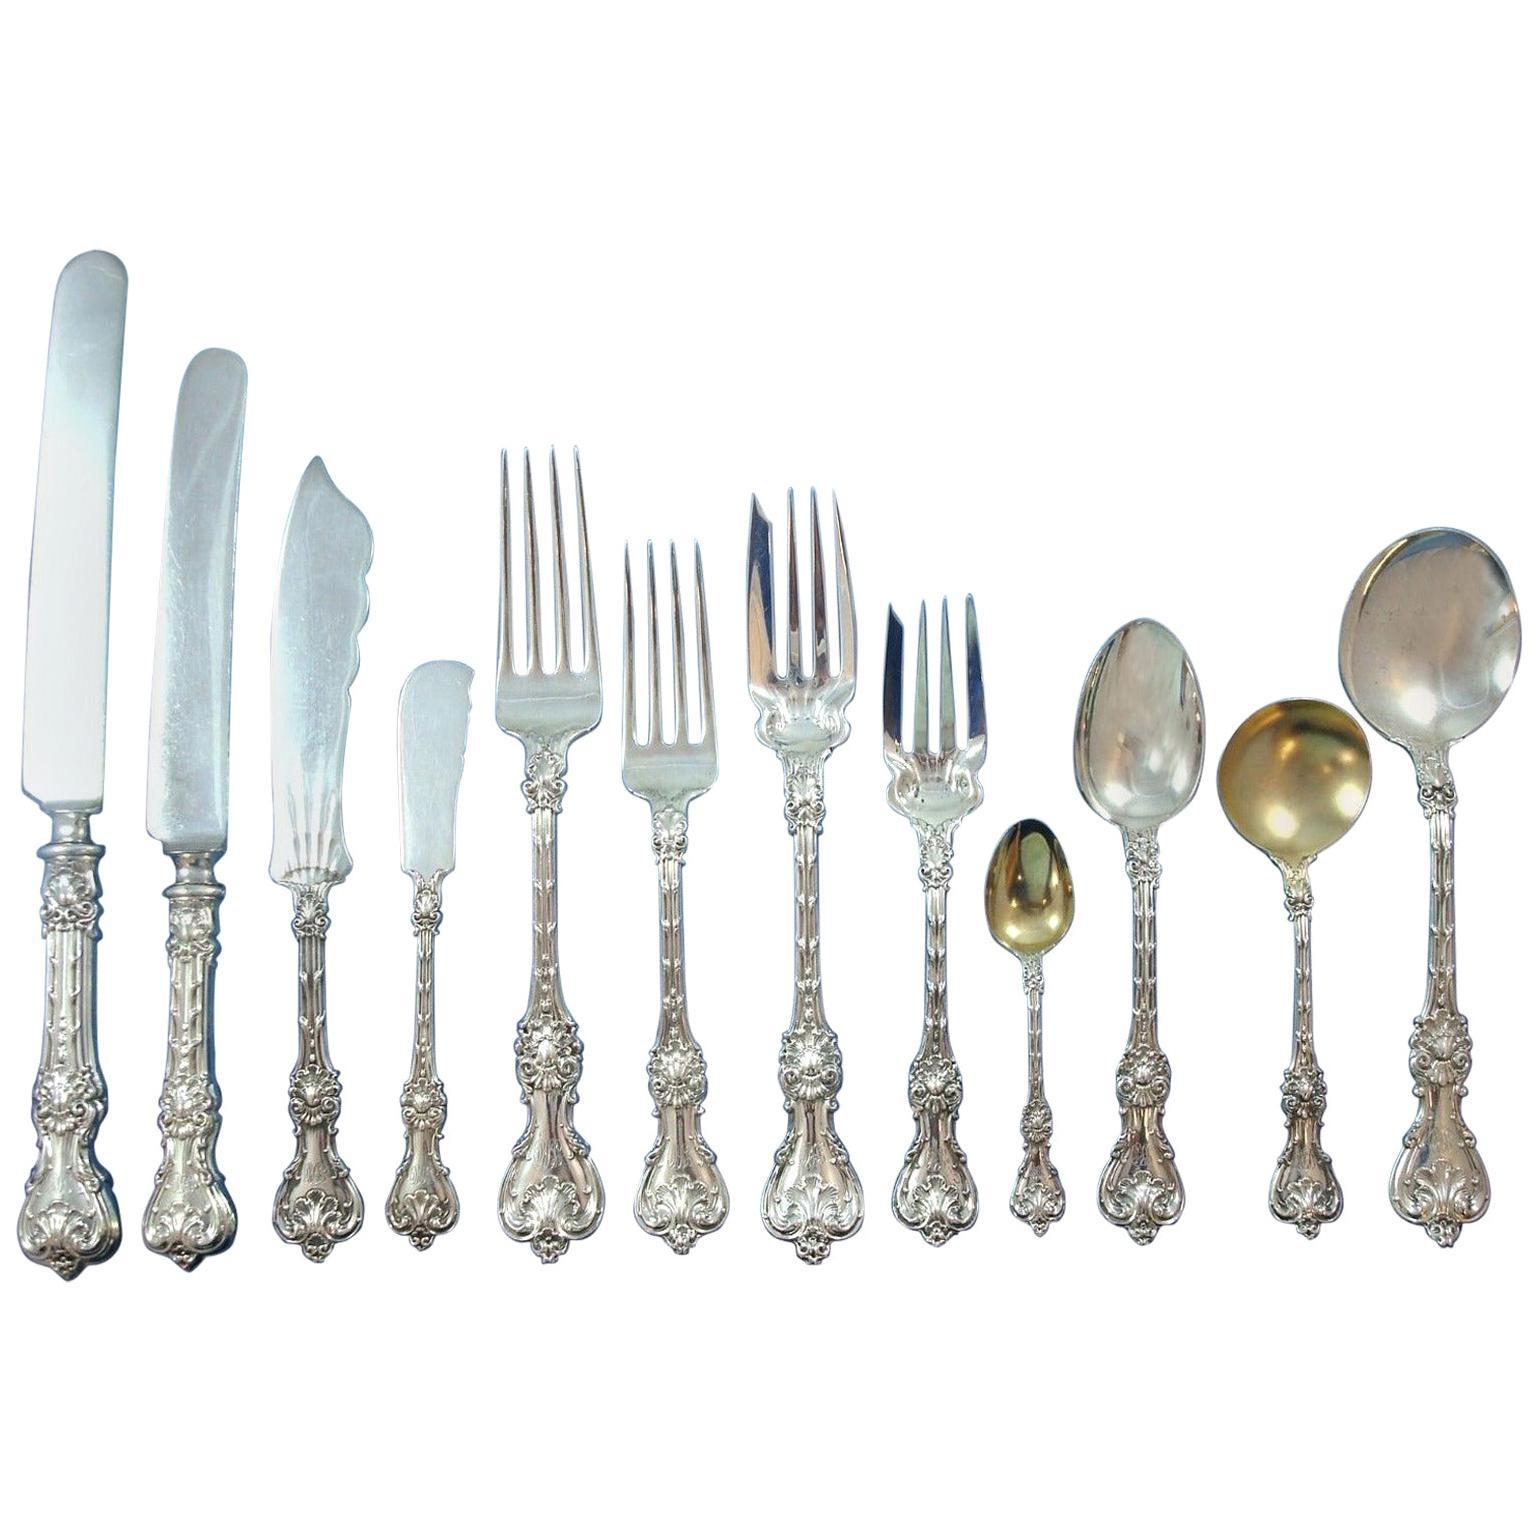 King Edward by Gorham Sterling Silver Demitasse Spoon